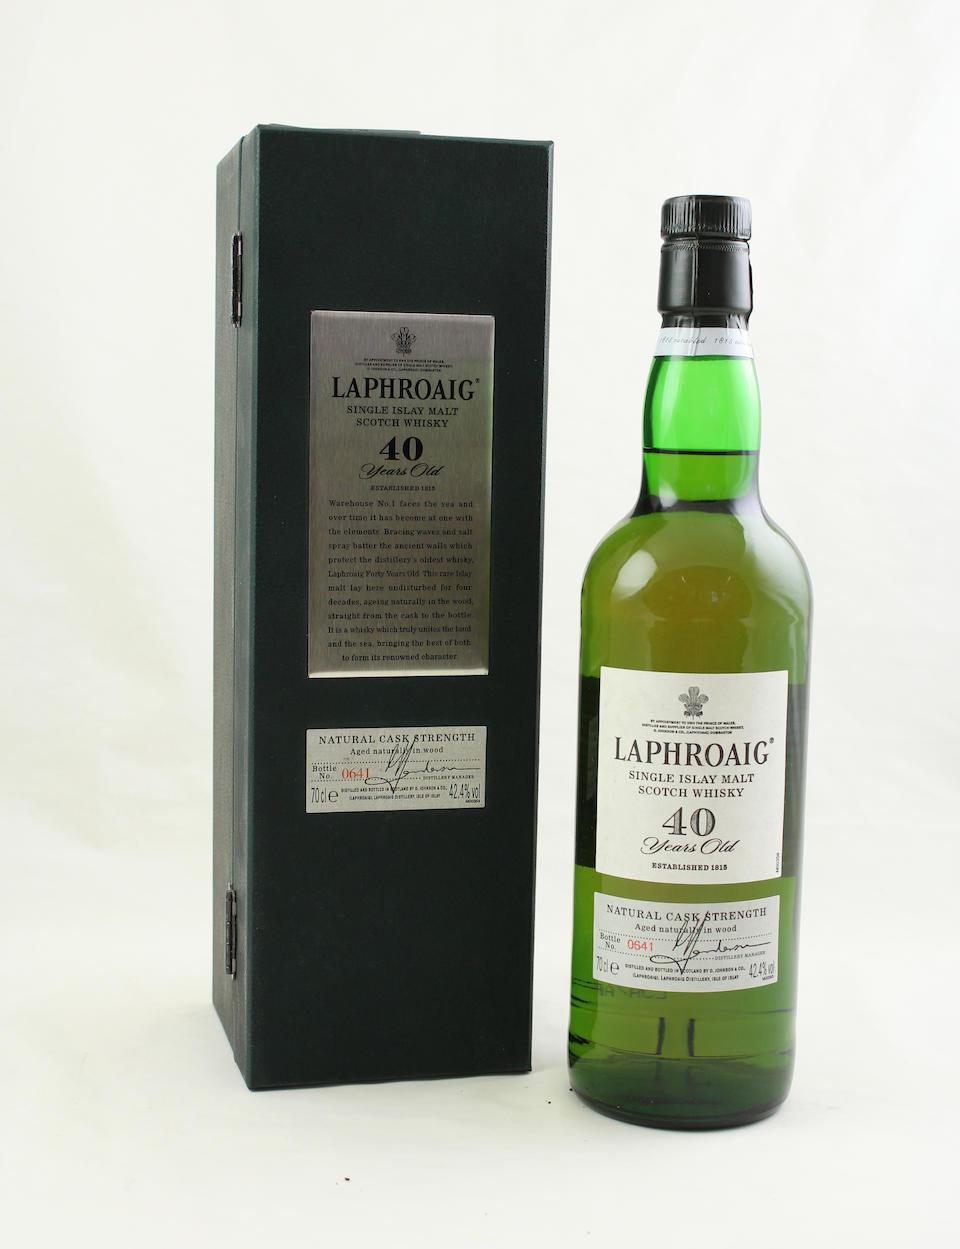 Laphroaig-40 year old-1960